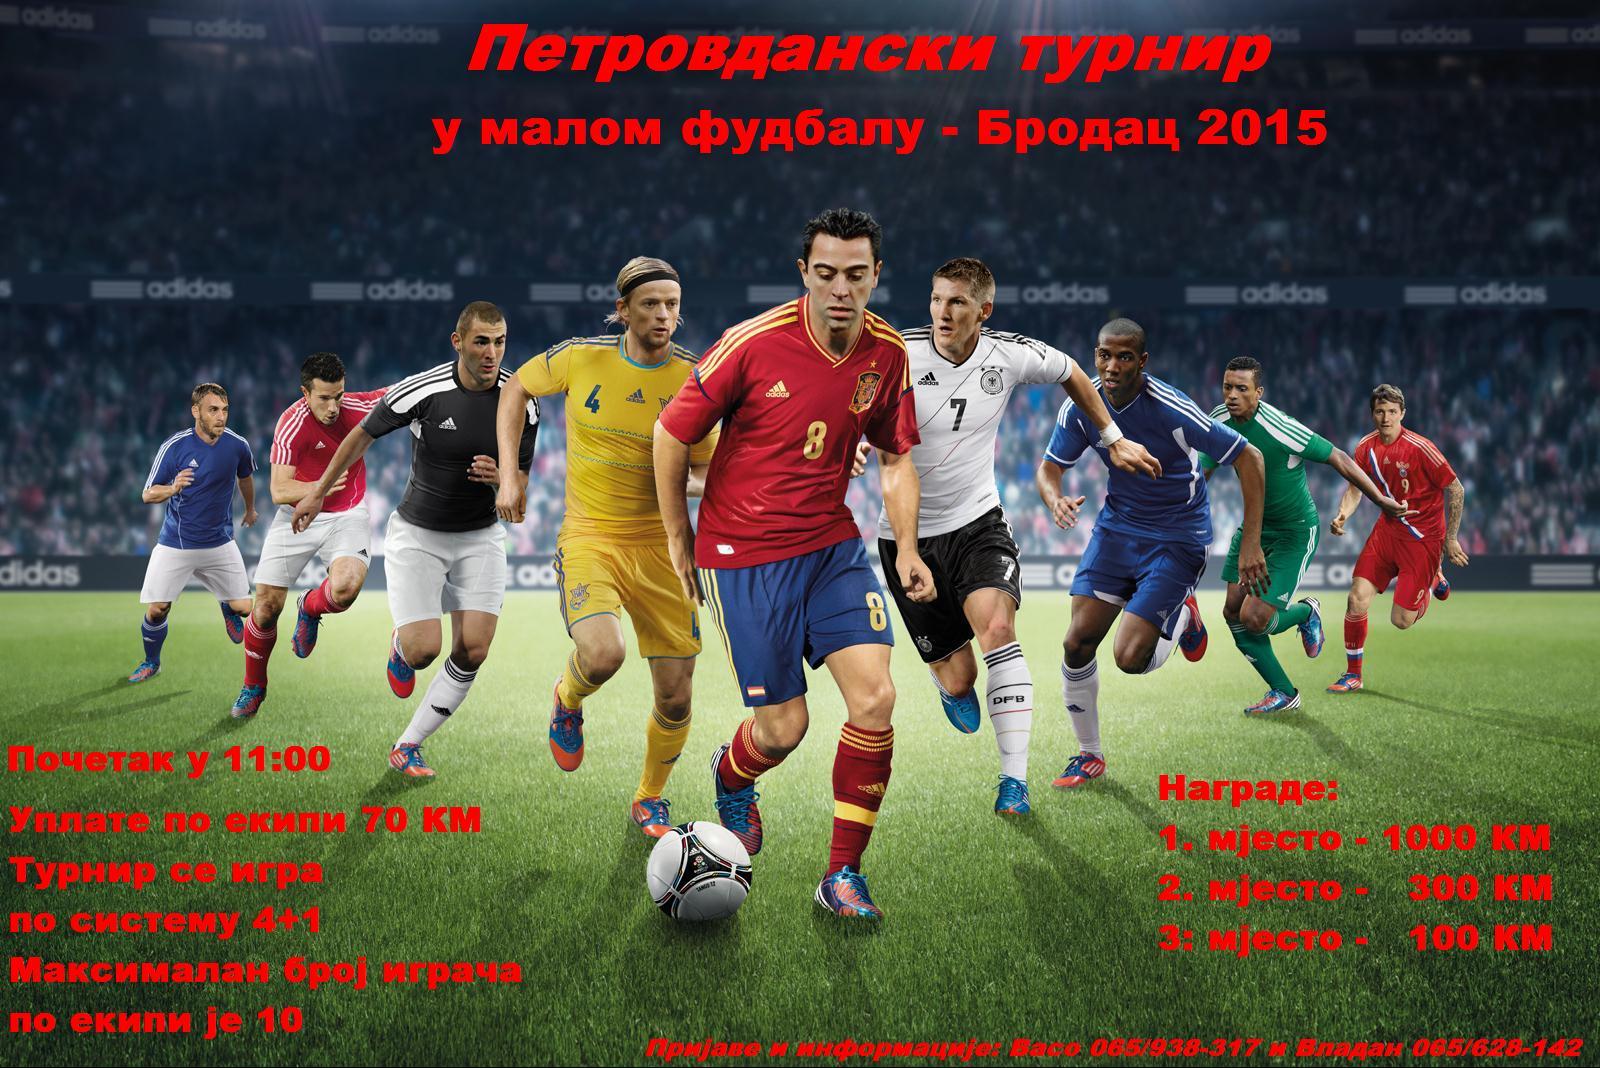 petrovdanski-turnir-u-malom-fudbalu